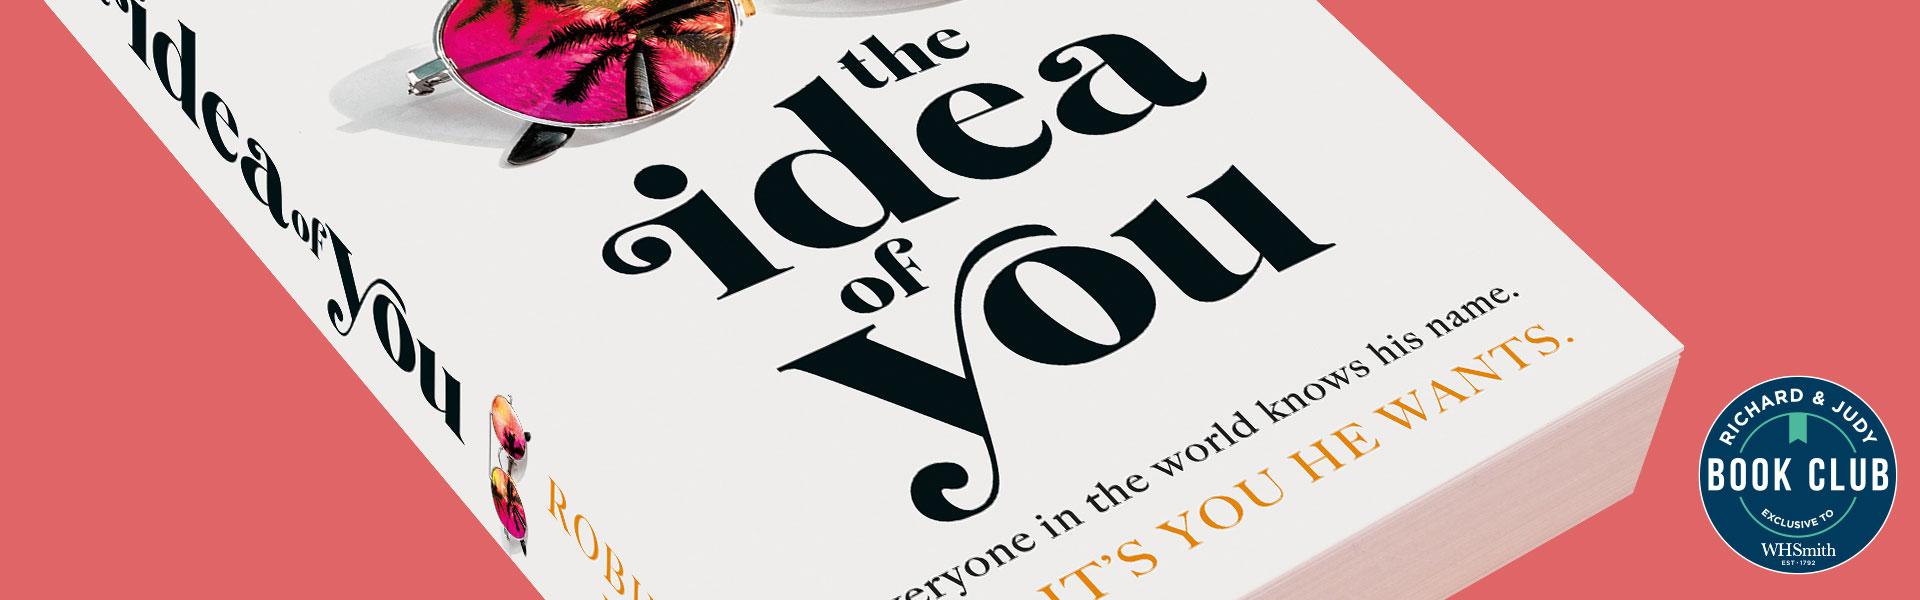 Richard & Judy Introduce The Idea of You by Robinne Lee